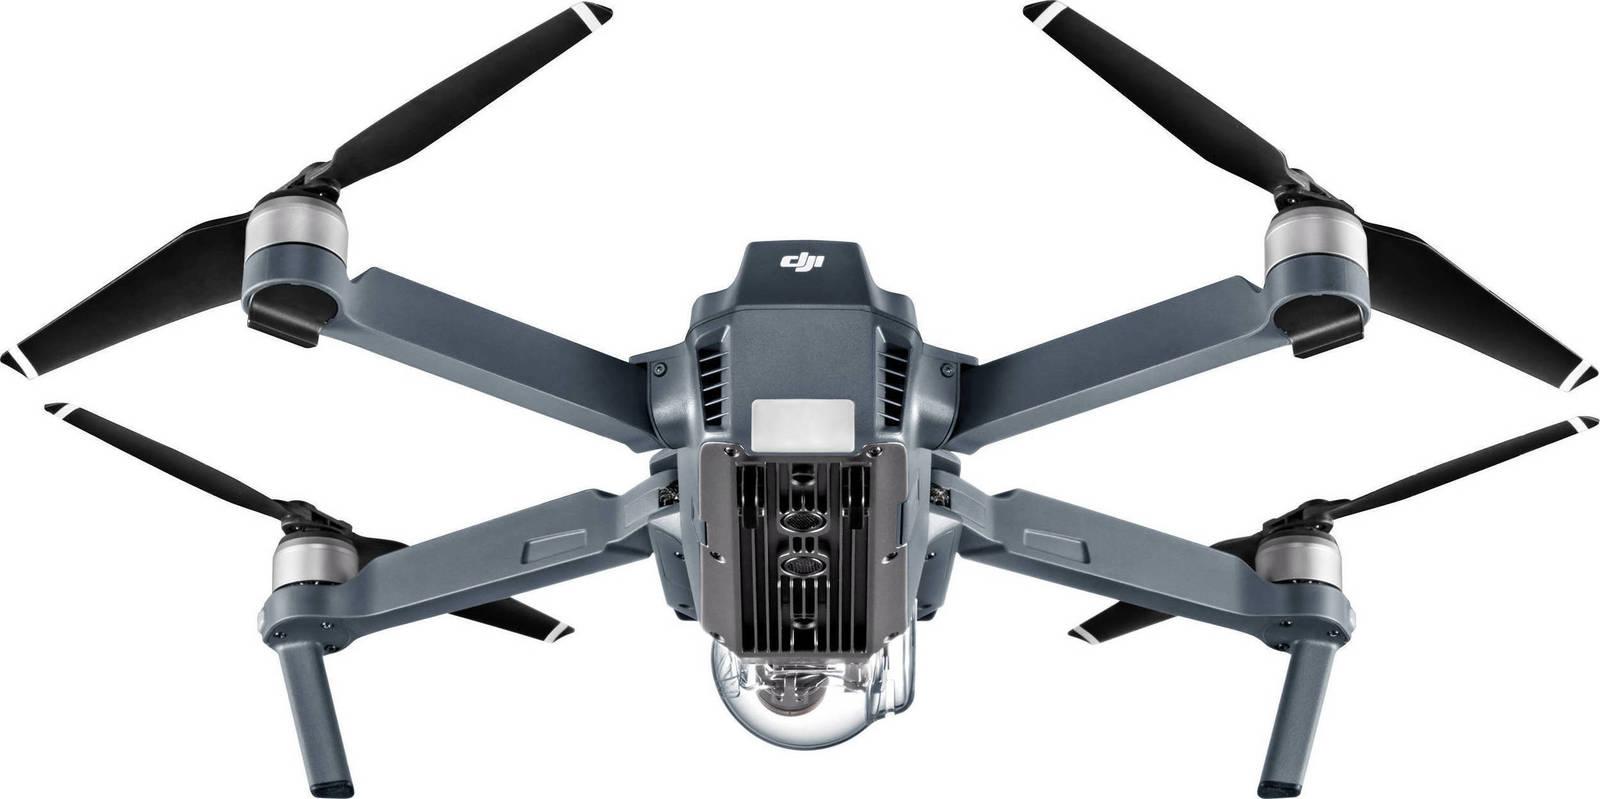 DJI Mavic Pro Drone Πληρωμή έως 24 δόσεις